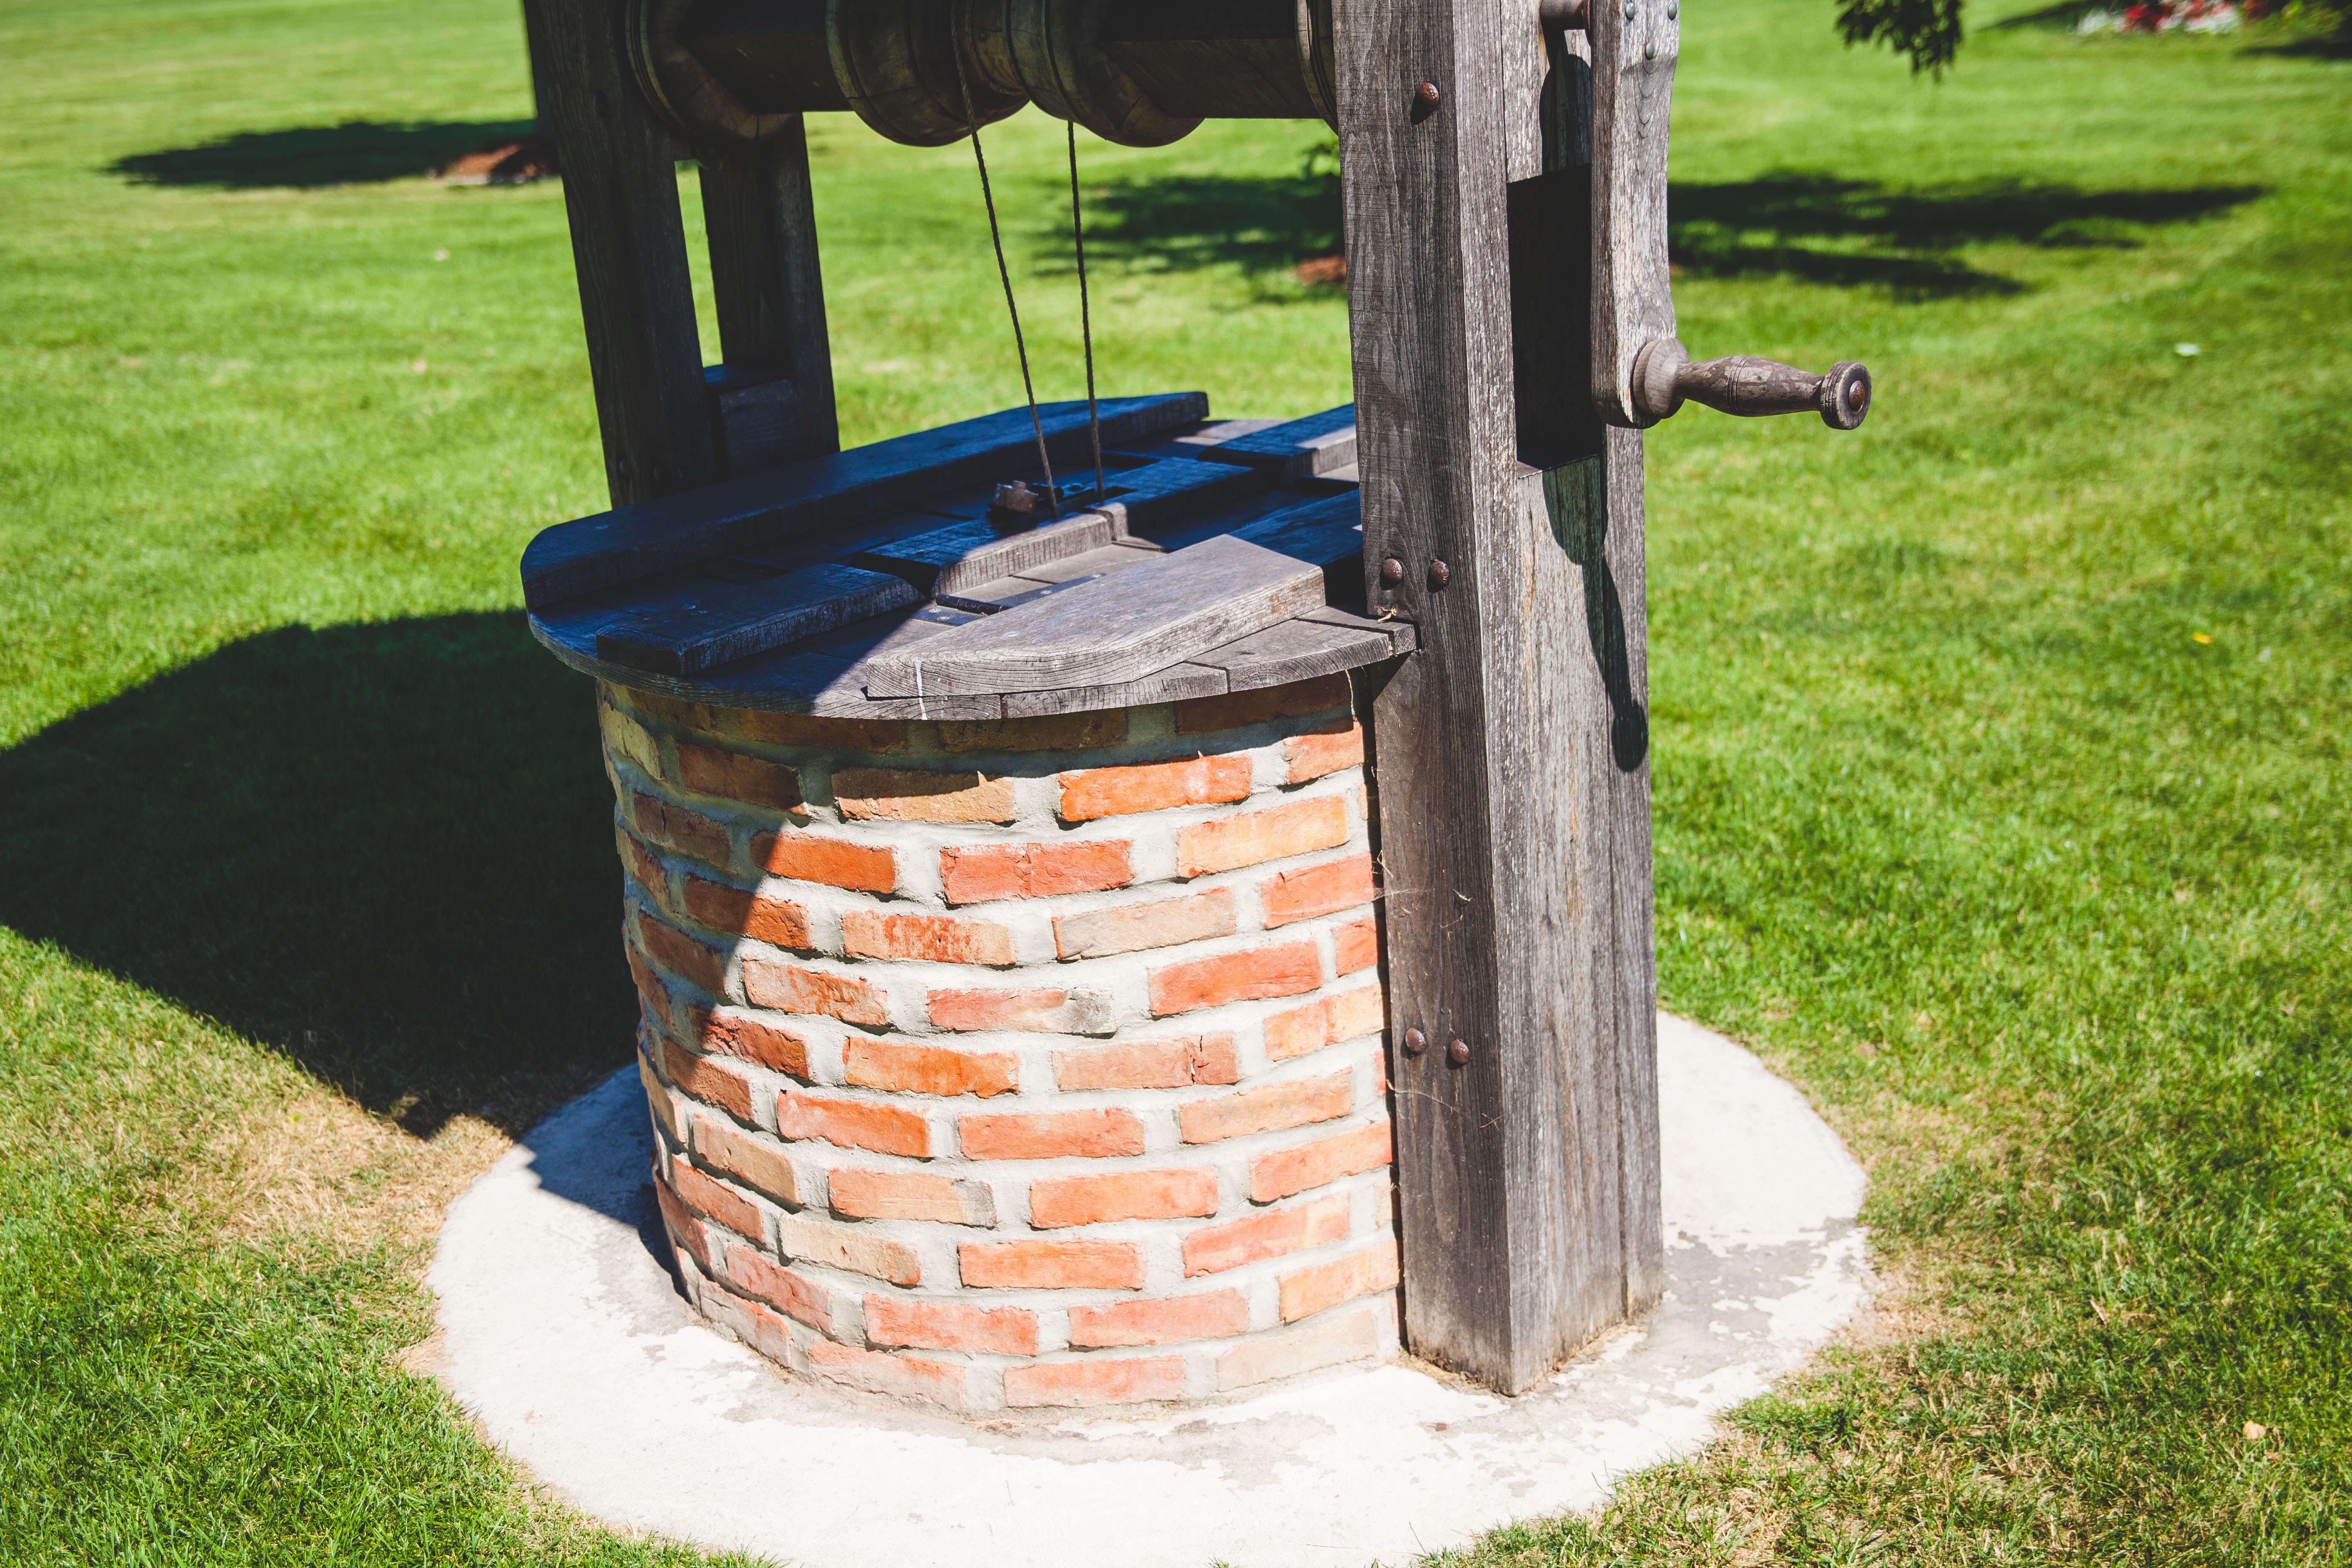 free images grass lawn backyard bricks yard man made object